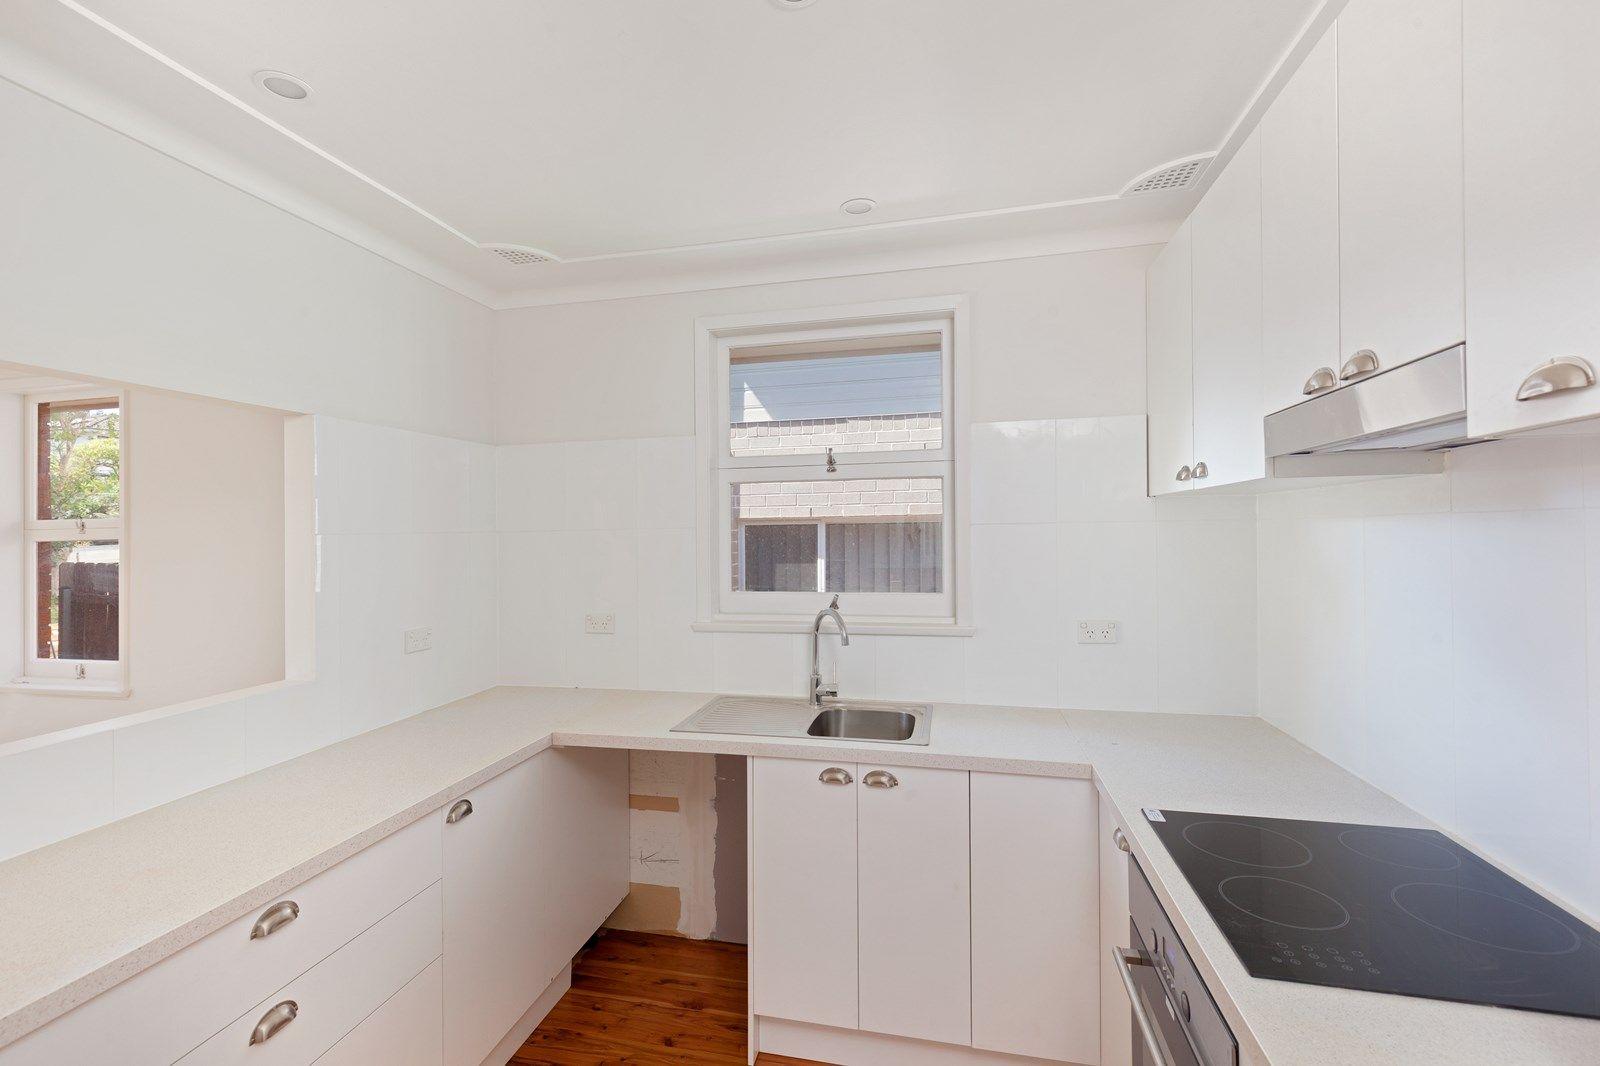 74 Fuller Street, Collaroy Plateau NSW 2097, Image 2